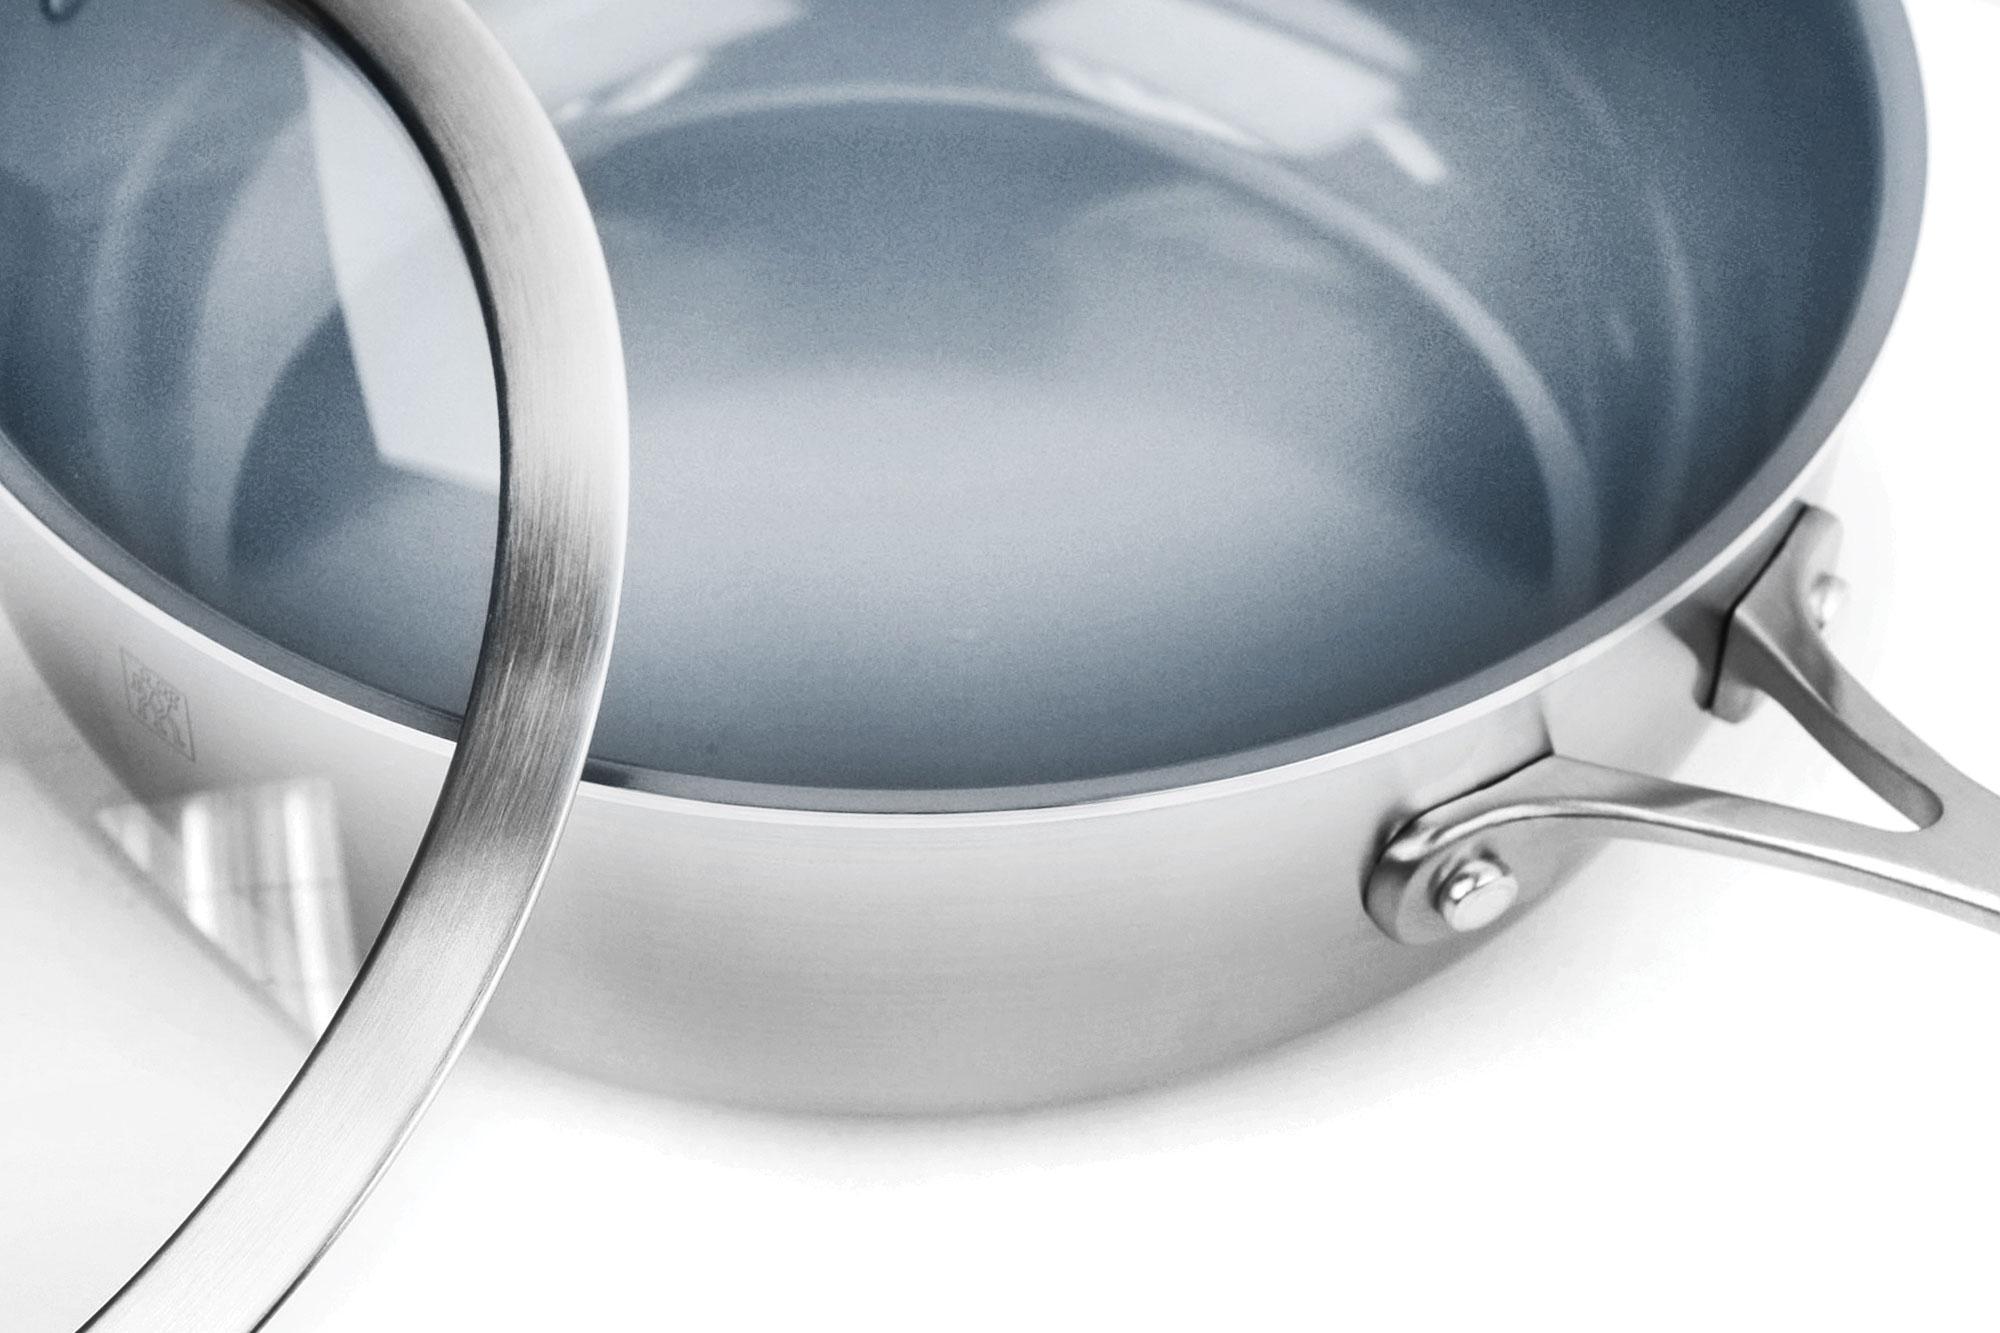 Zwilling Spirit Ceramic Nonstick Perfect Pan 4 6 Quart By